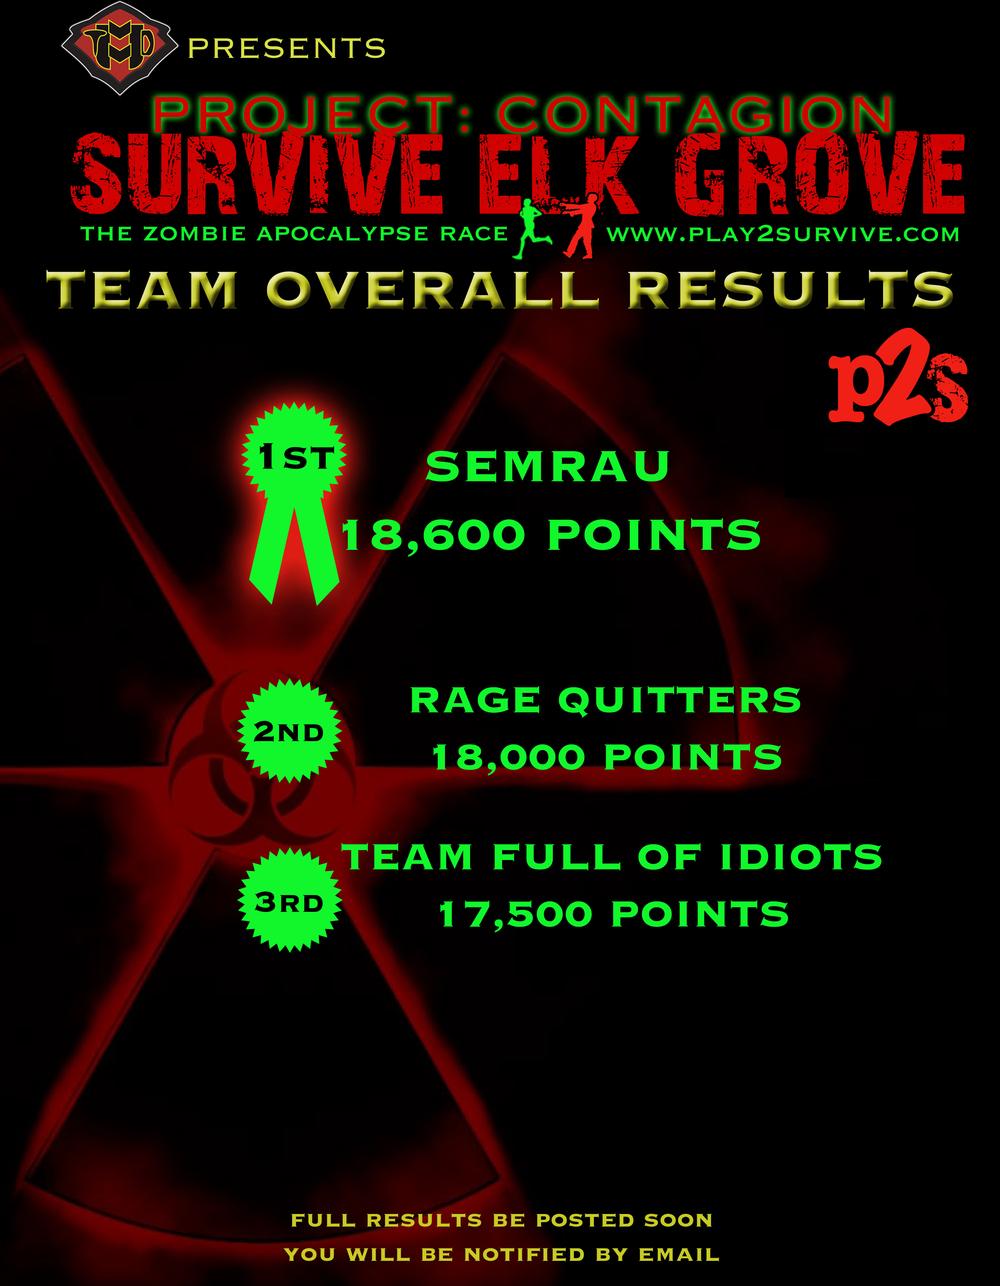 EG human team OVERALL results.jpg